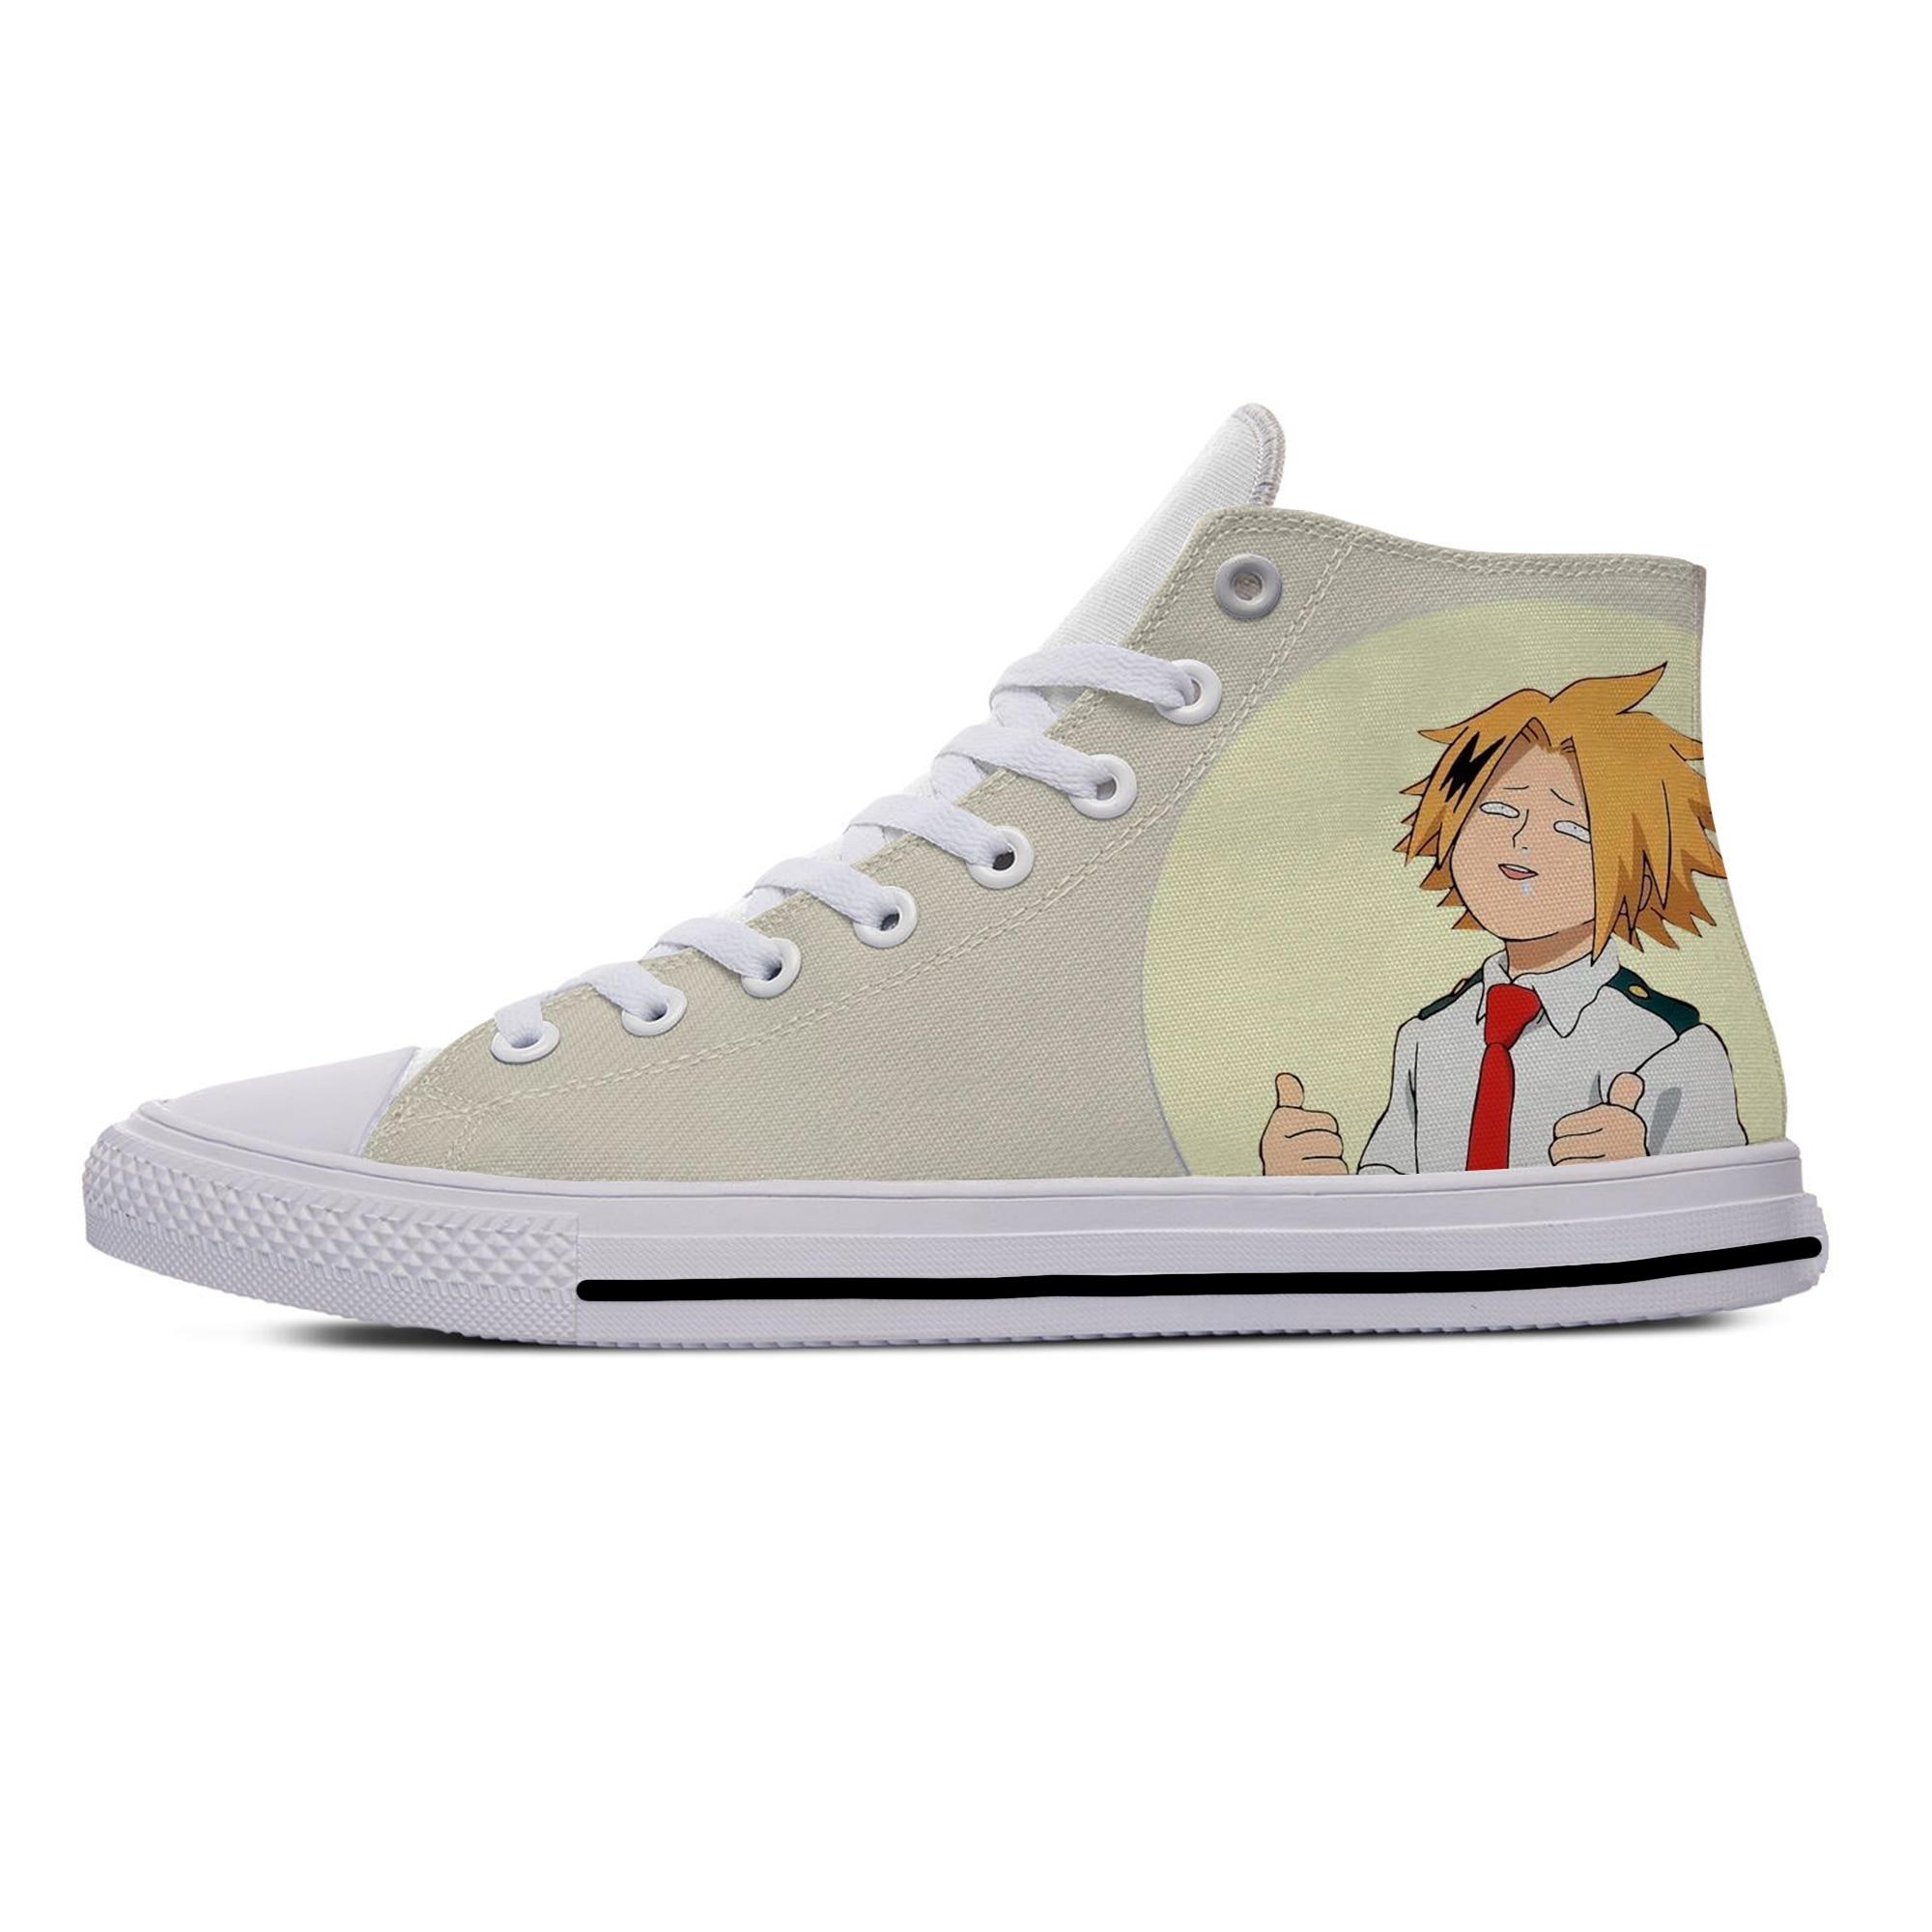 Japan Anime My Hero Academia Kaminari Denki Funny Casual Canvas Shoes High Top Harajuku Breathable 3D Printed Men Women Sneaker